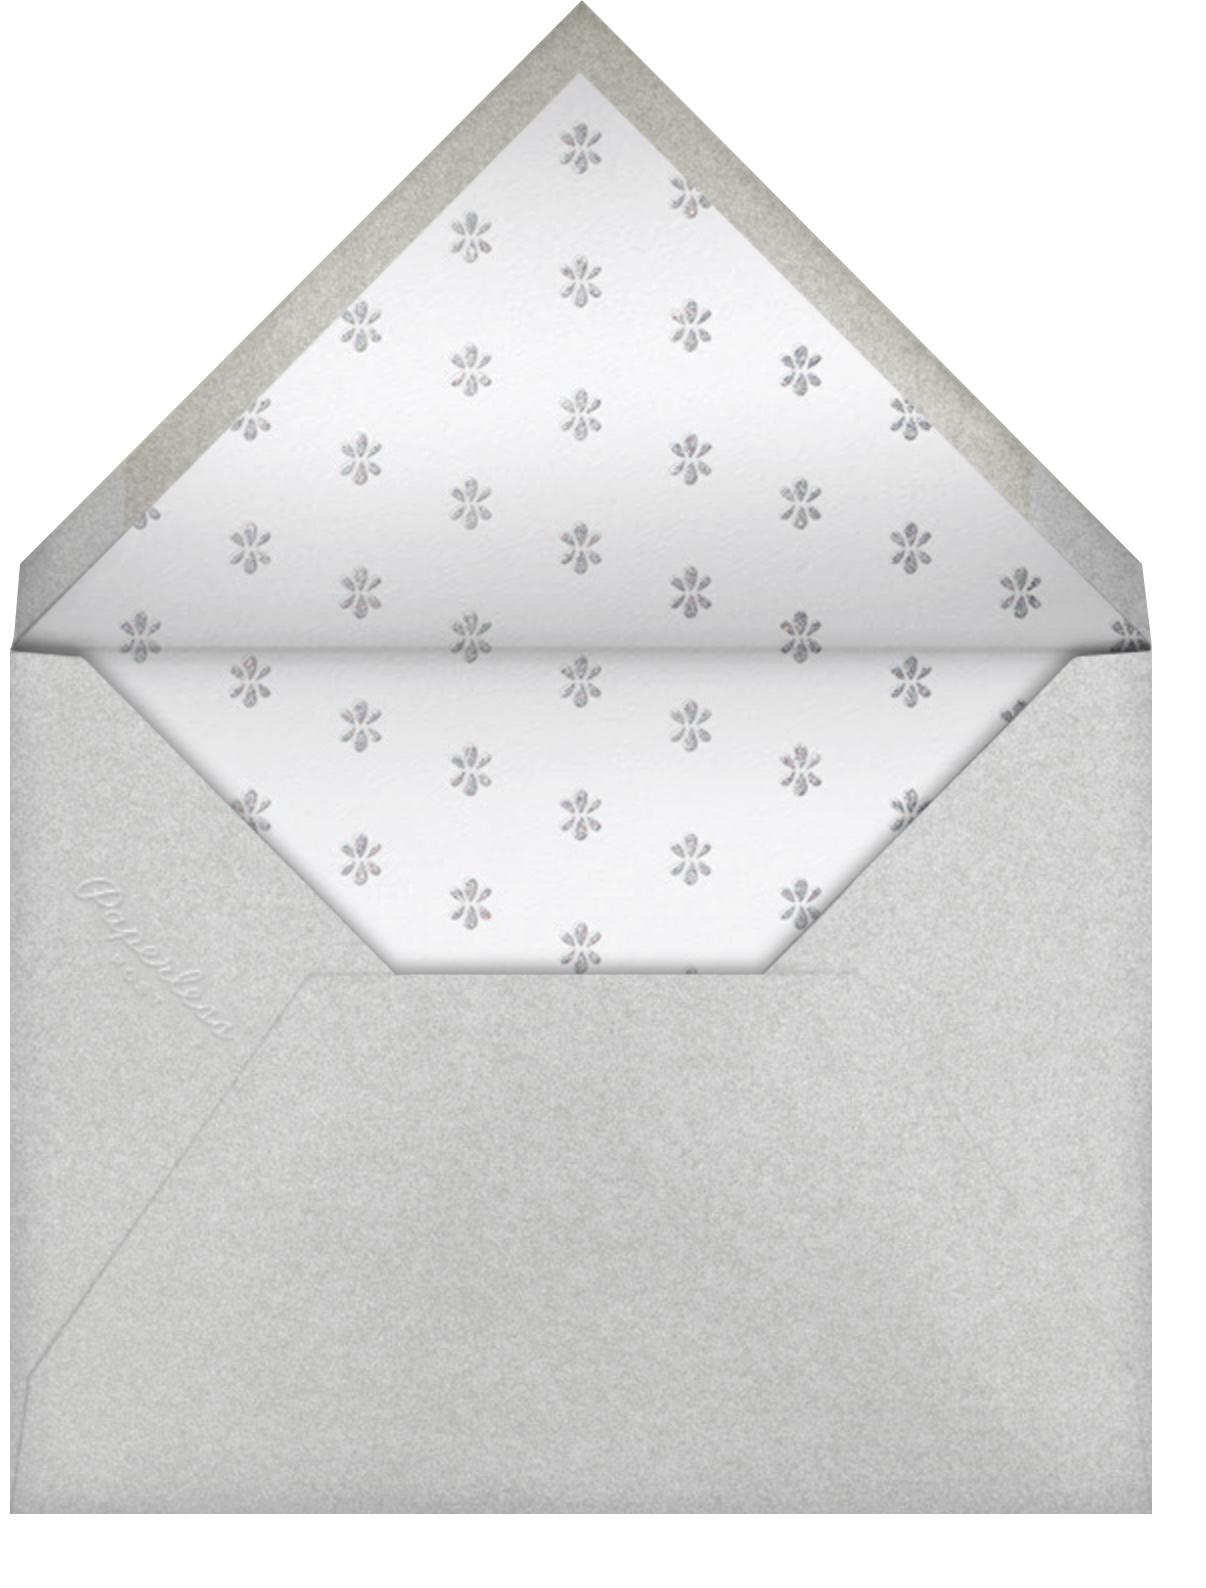 Ornate Occasion - White - Paperless Post - Envelope